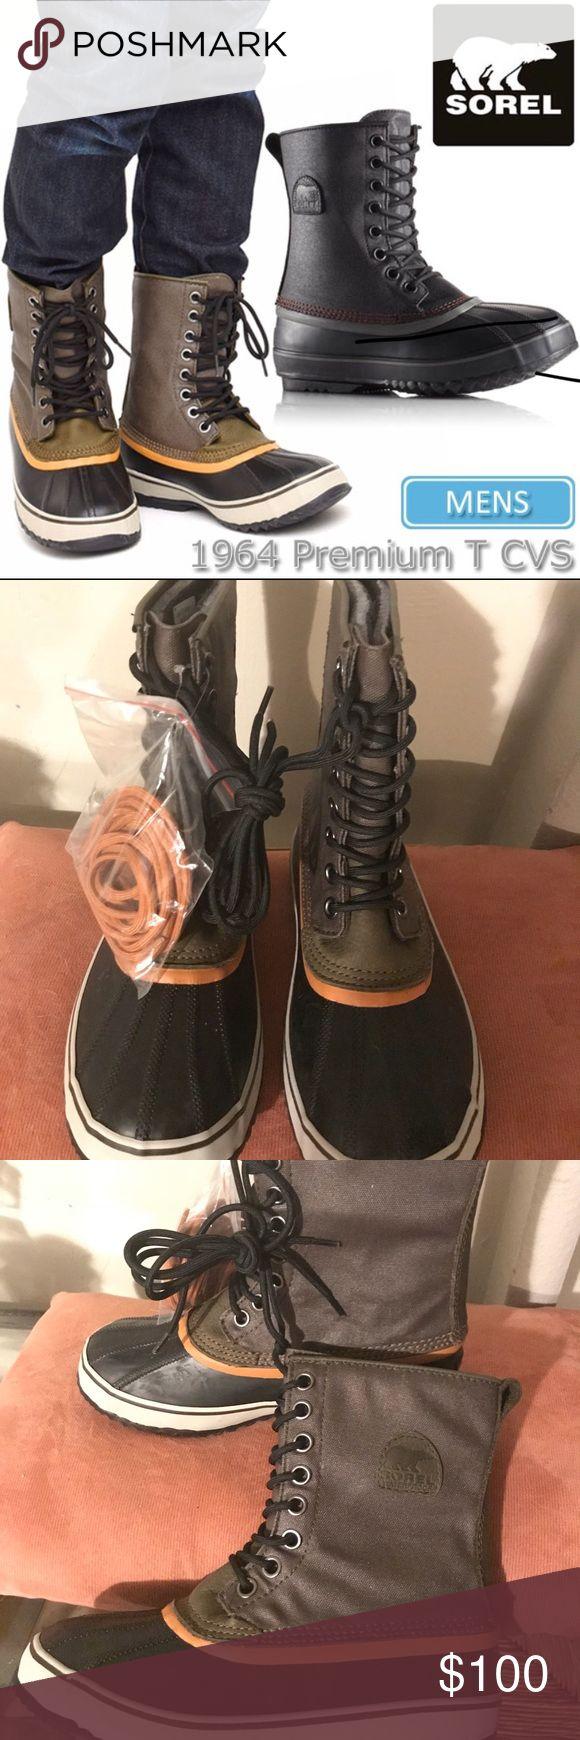 Sorel men's premium t cvs Out of stock. Waterproof men's sorel boots size 8. Sorel Shoes Boots